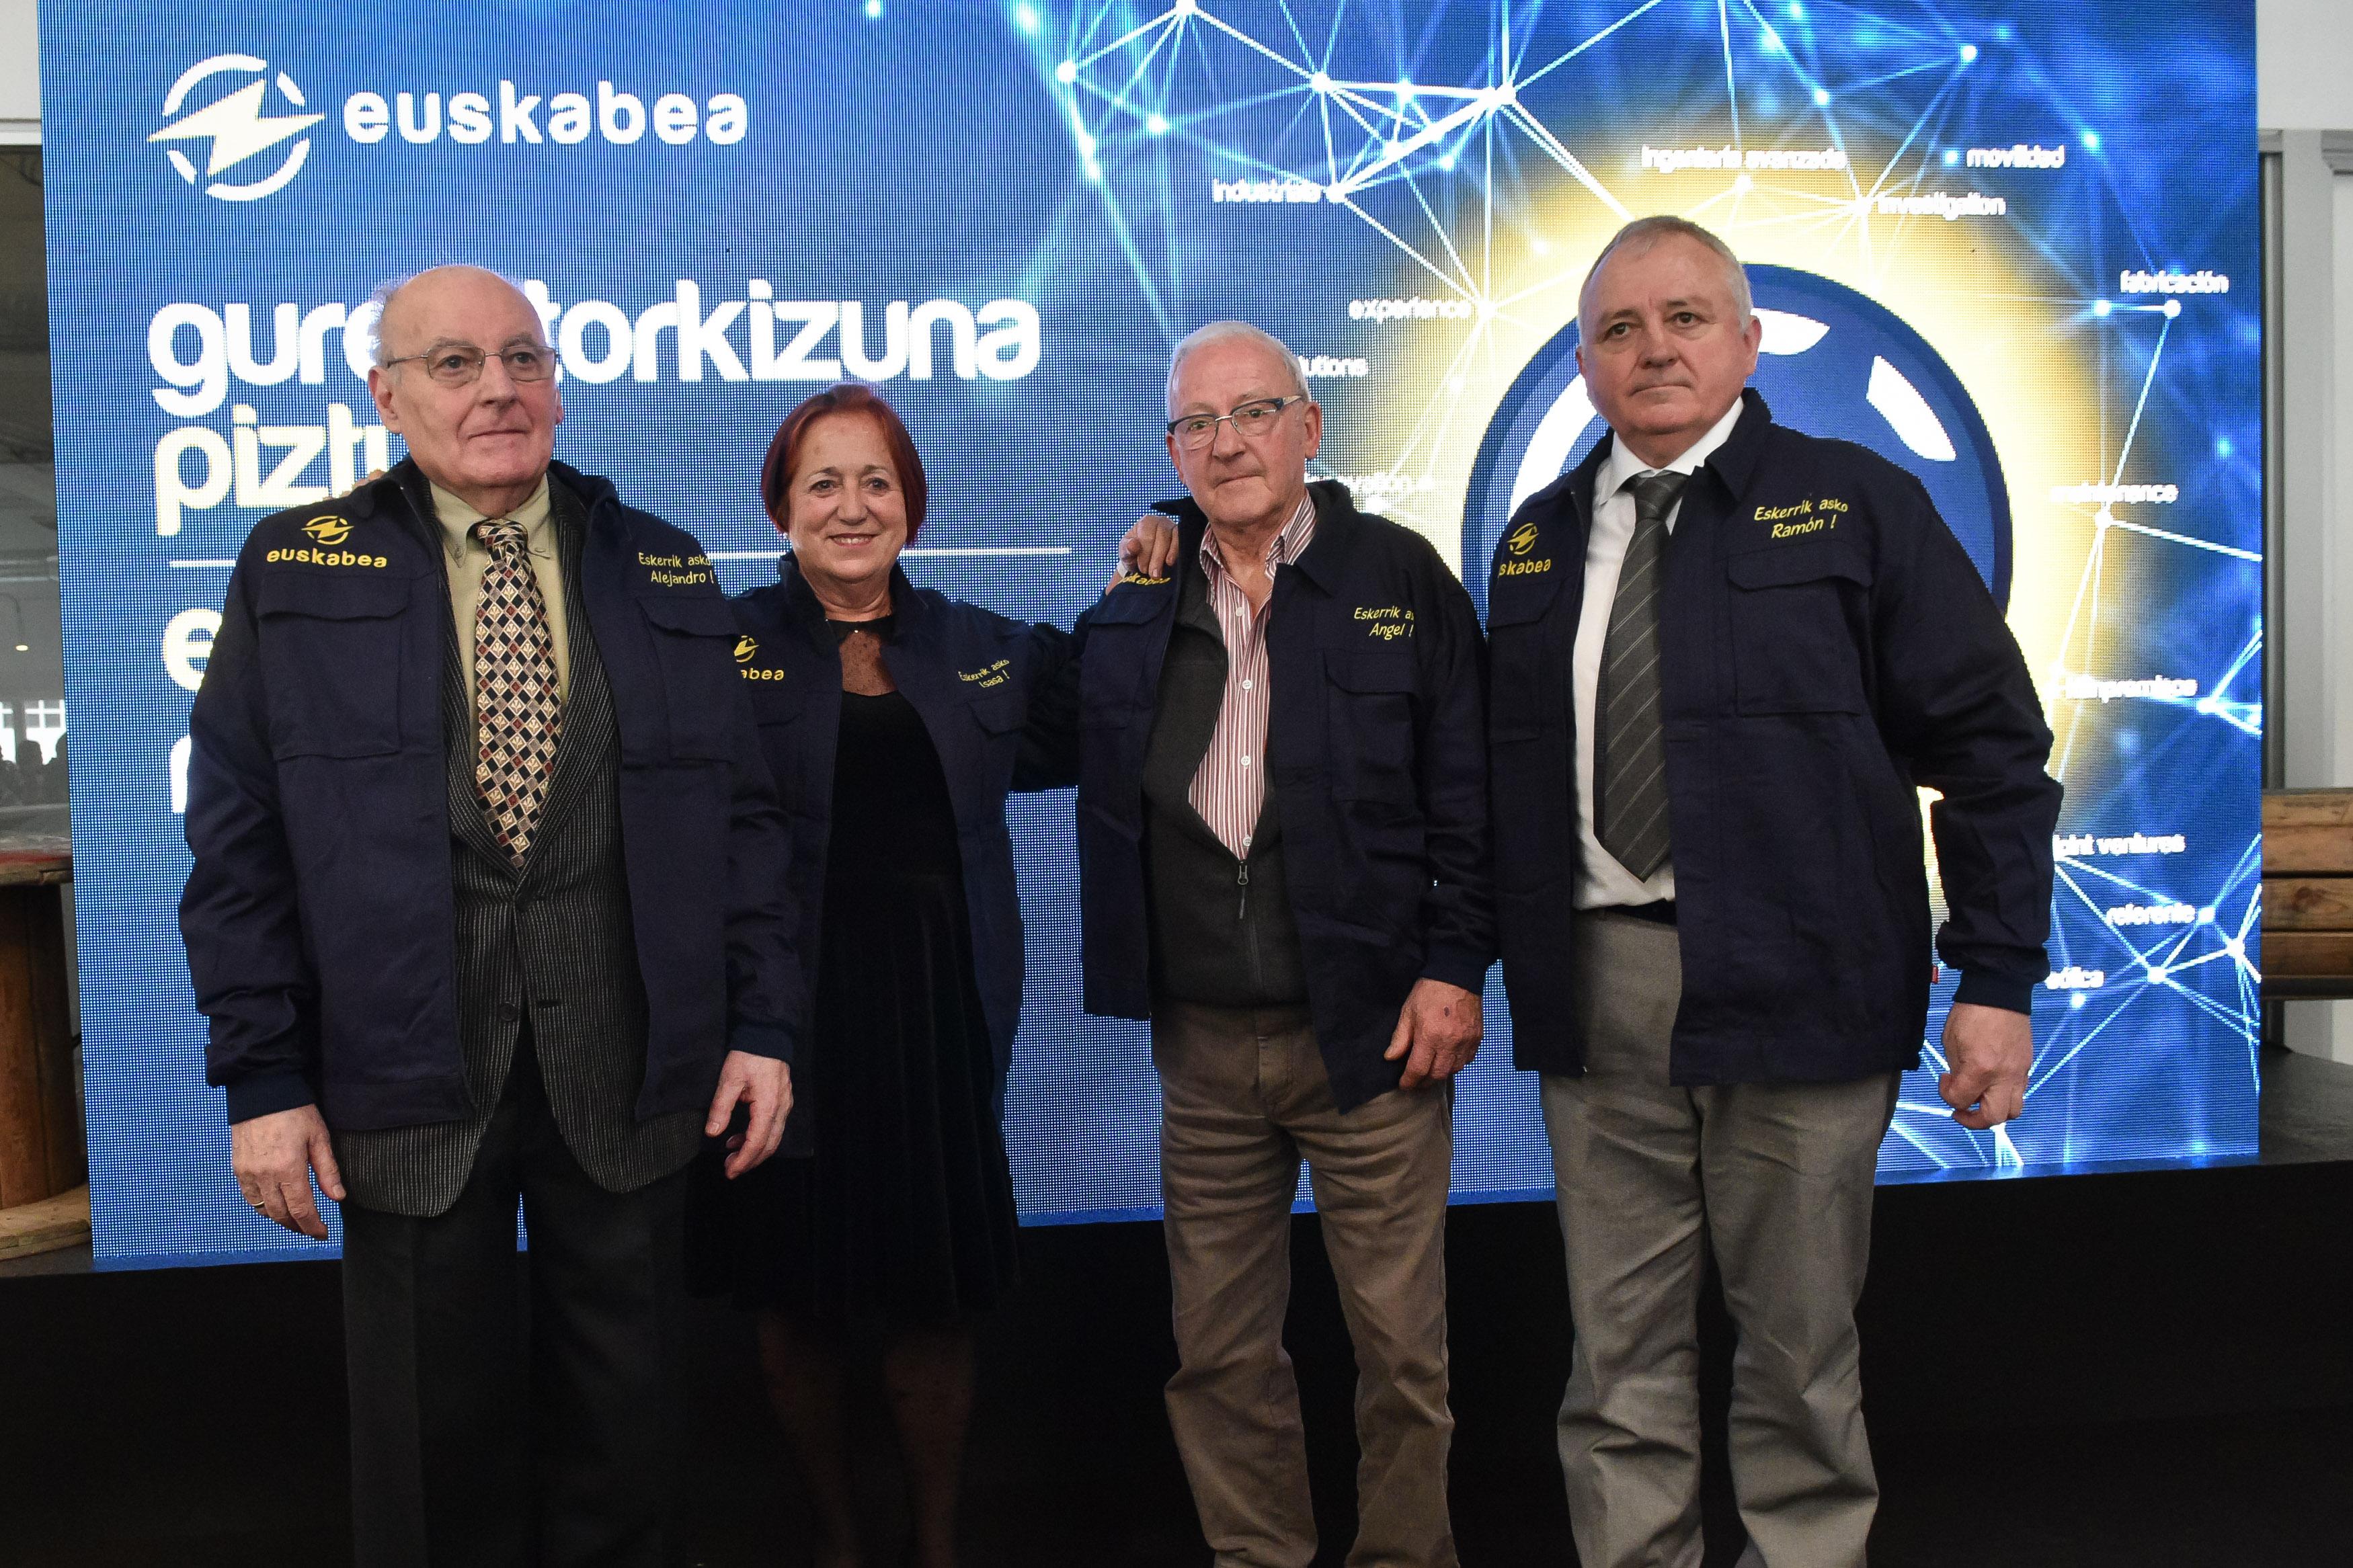 20191127-TAPIA-EUSKOBEA-148.jpg